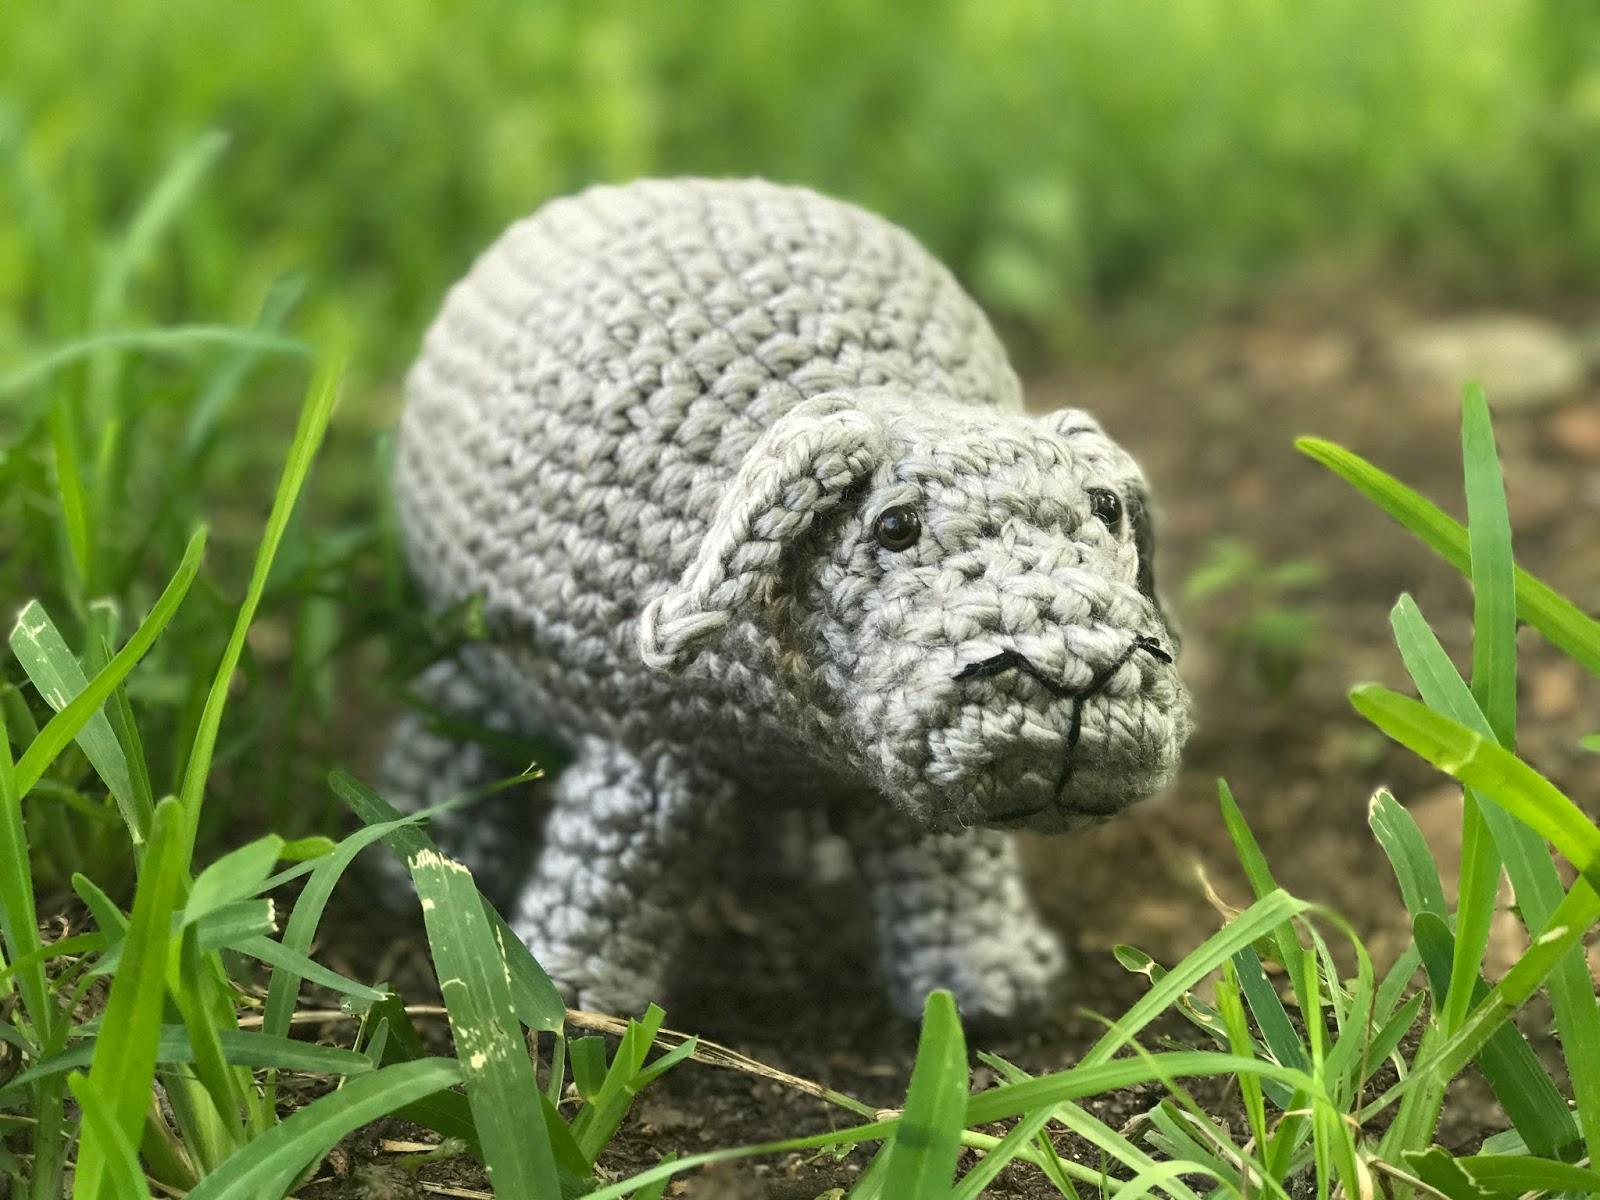 Amigurumi Pig : Craftyiscool okja the super pig amigurumi